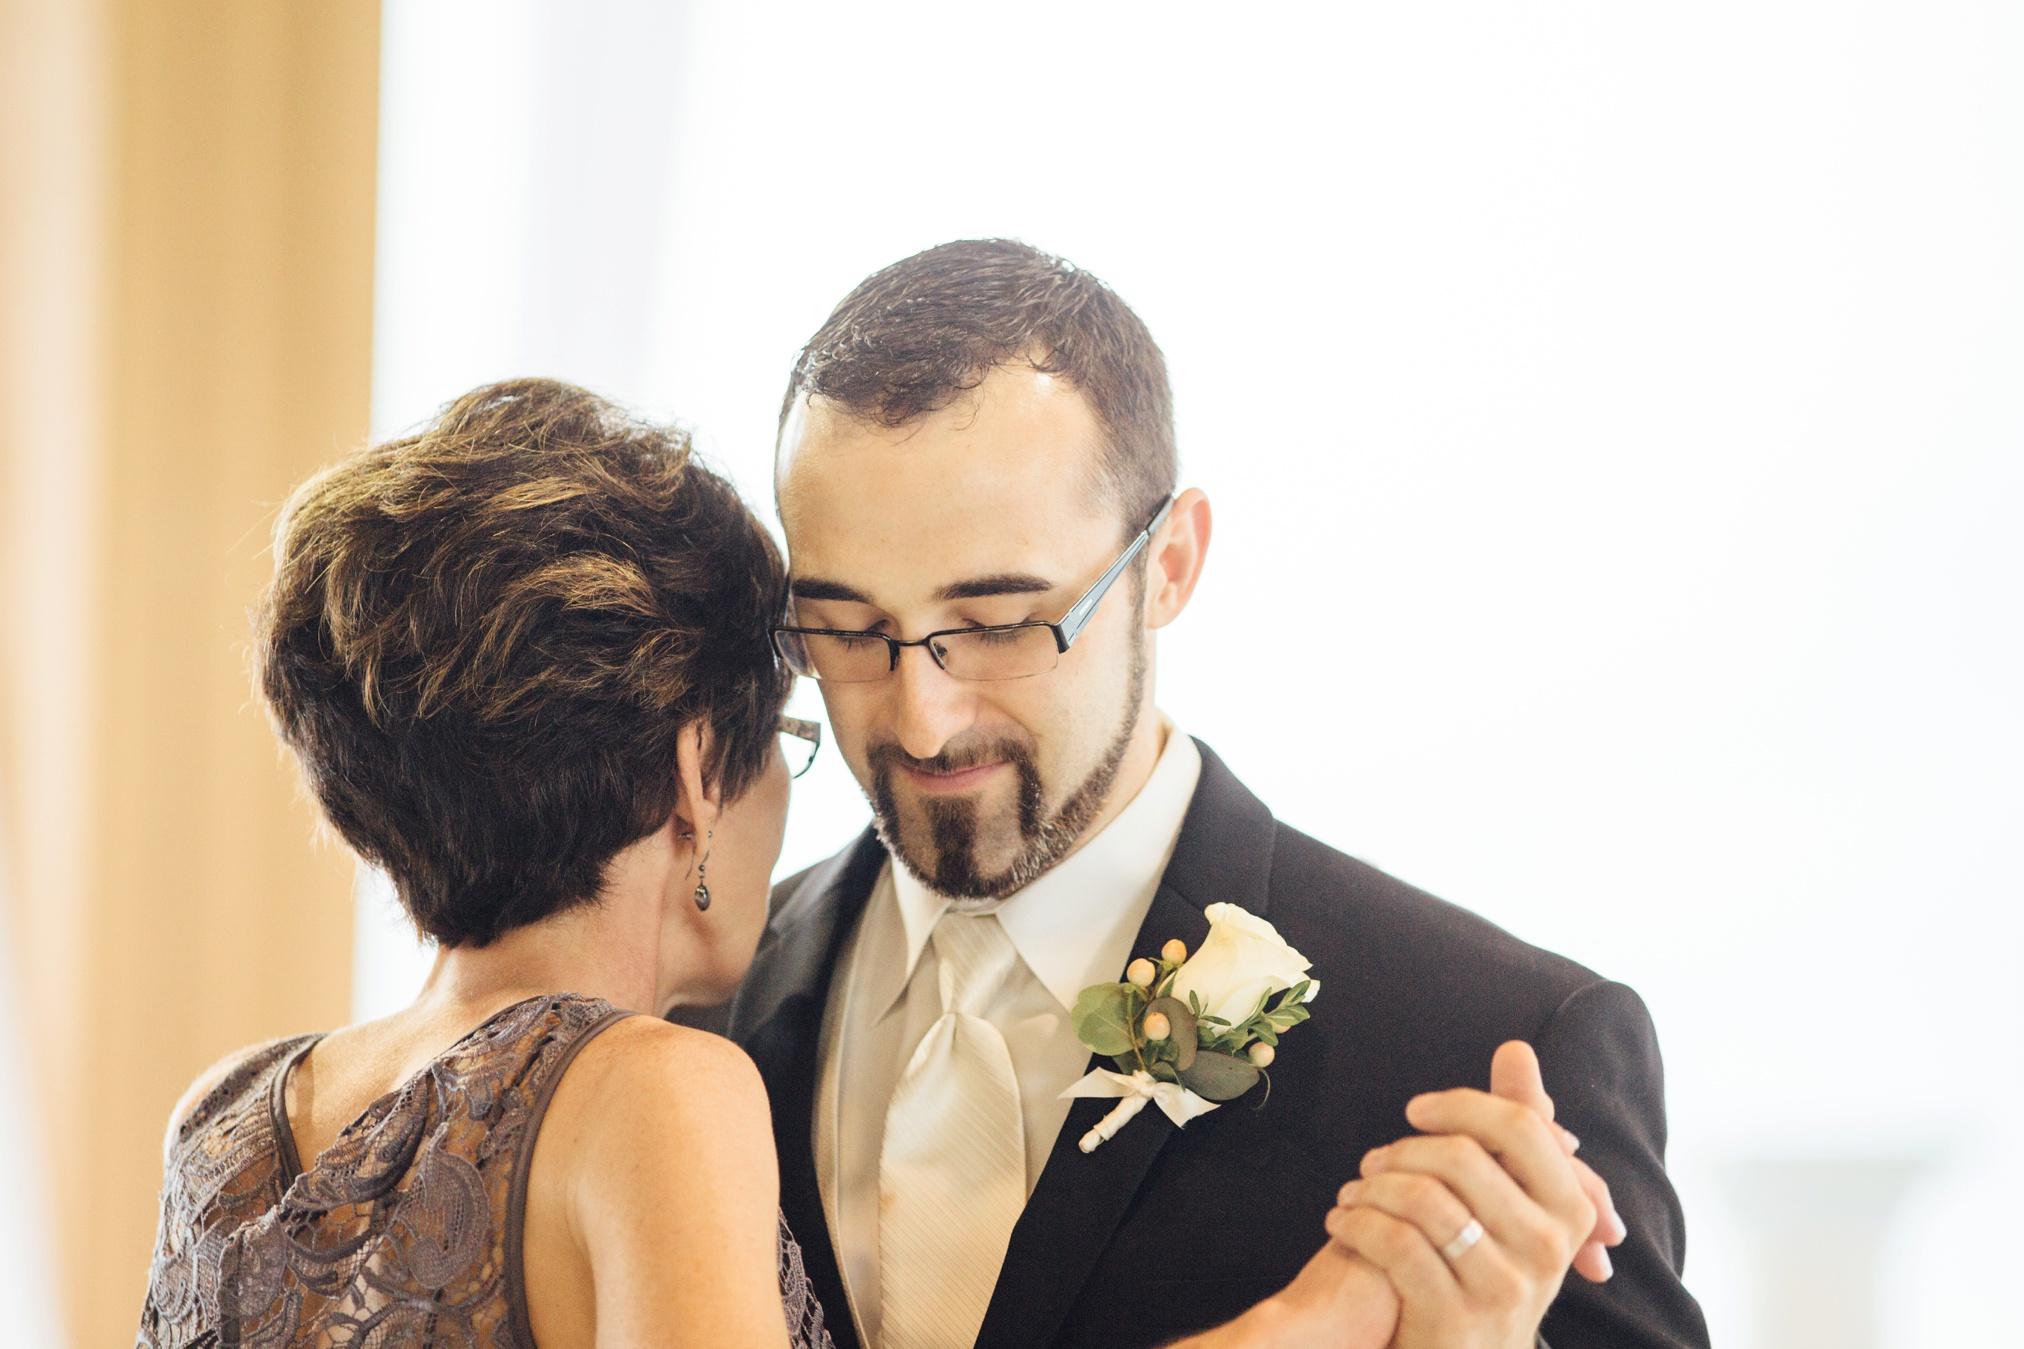 schmid_wedding-791.jpg